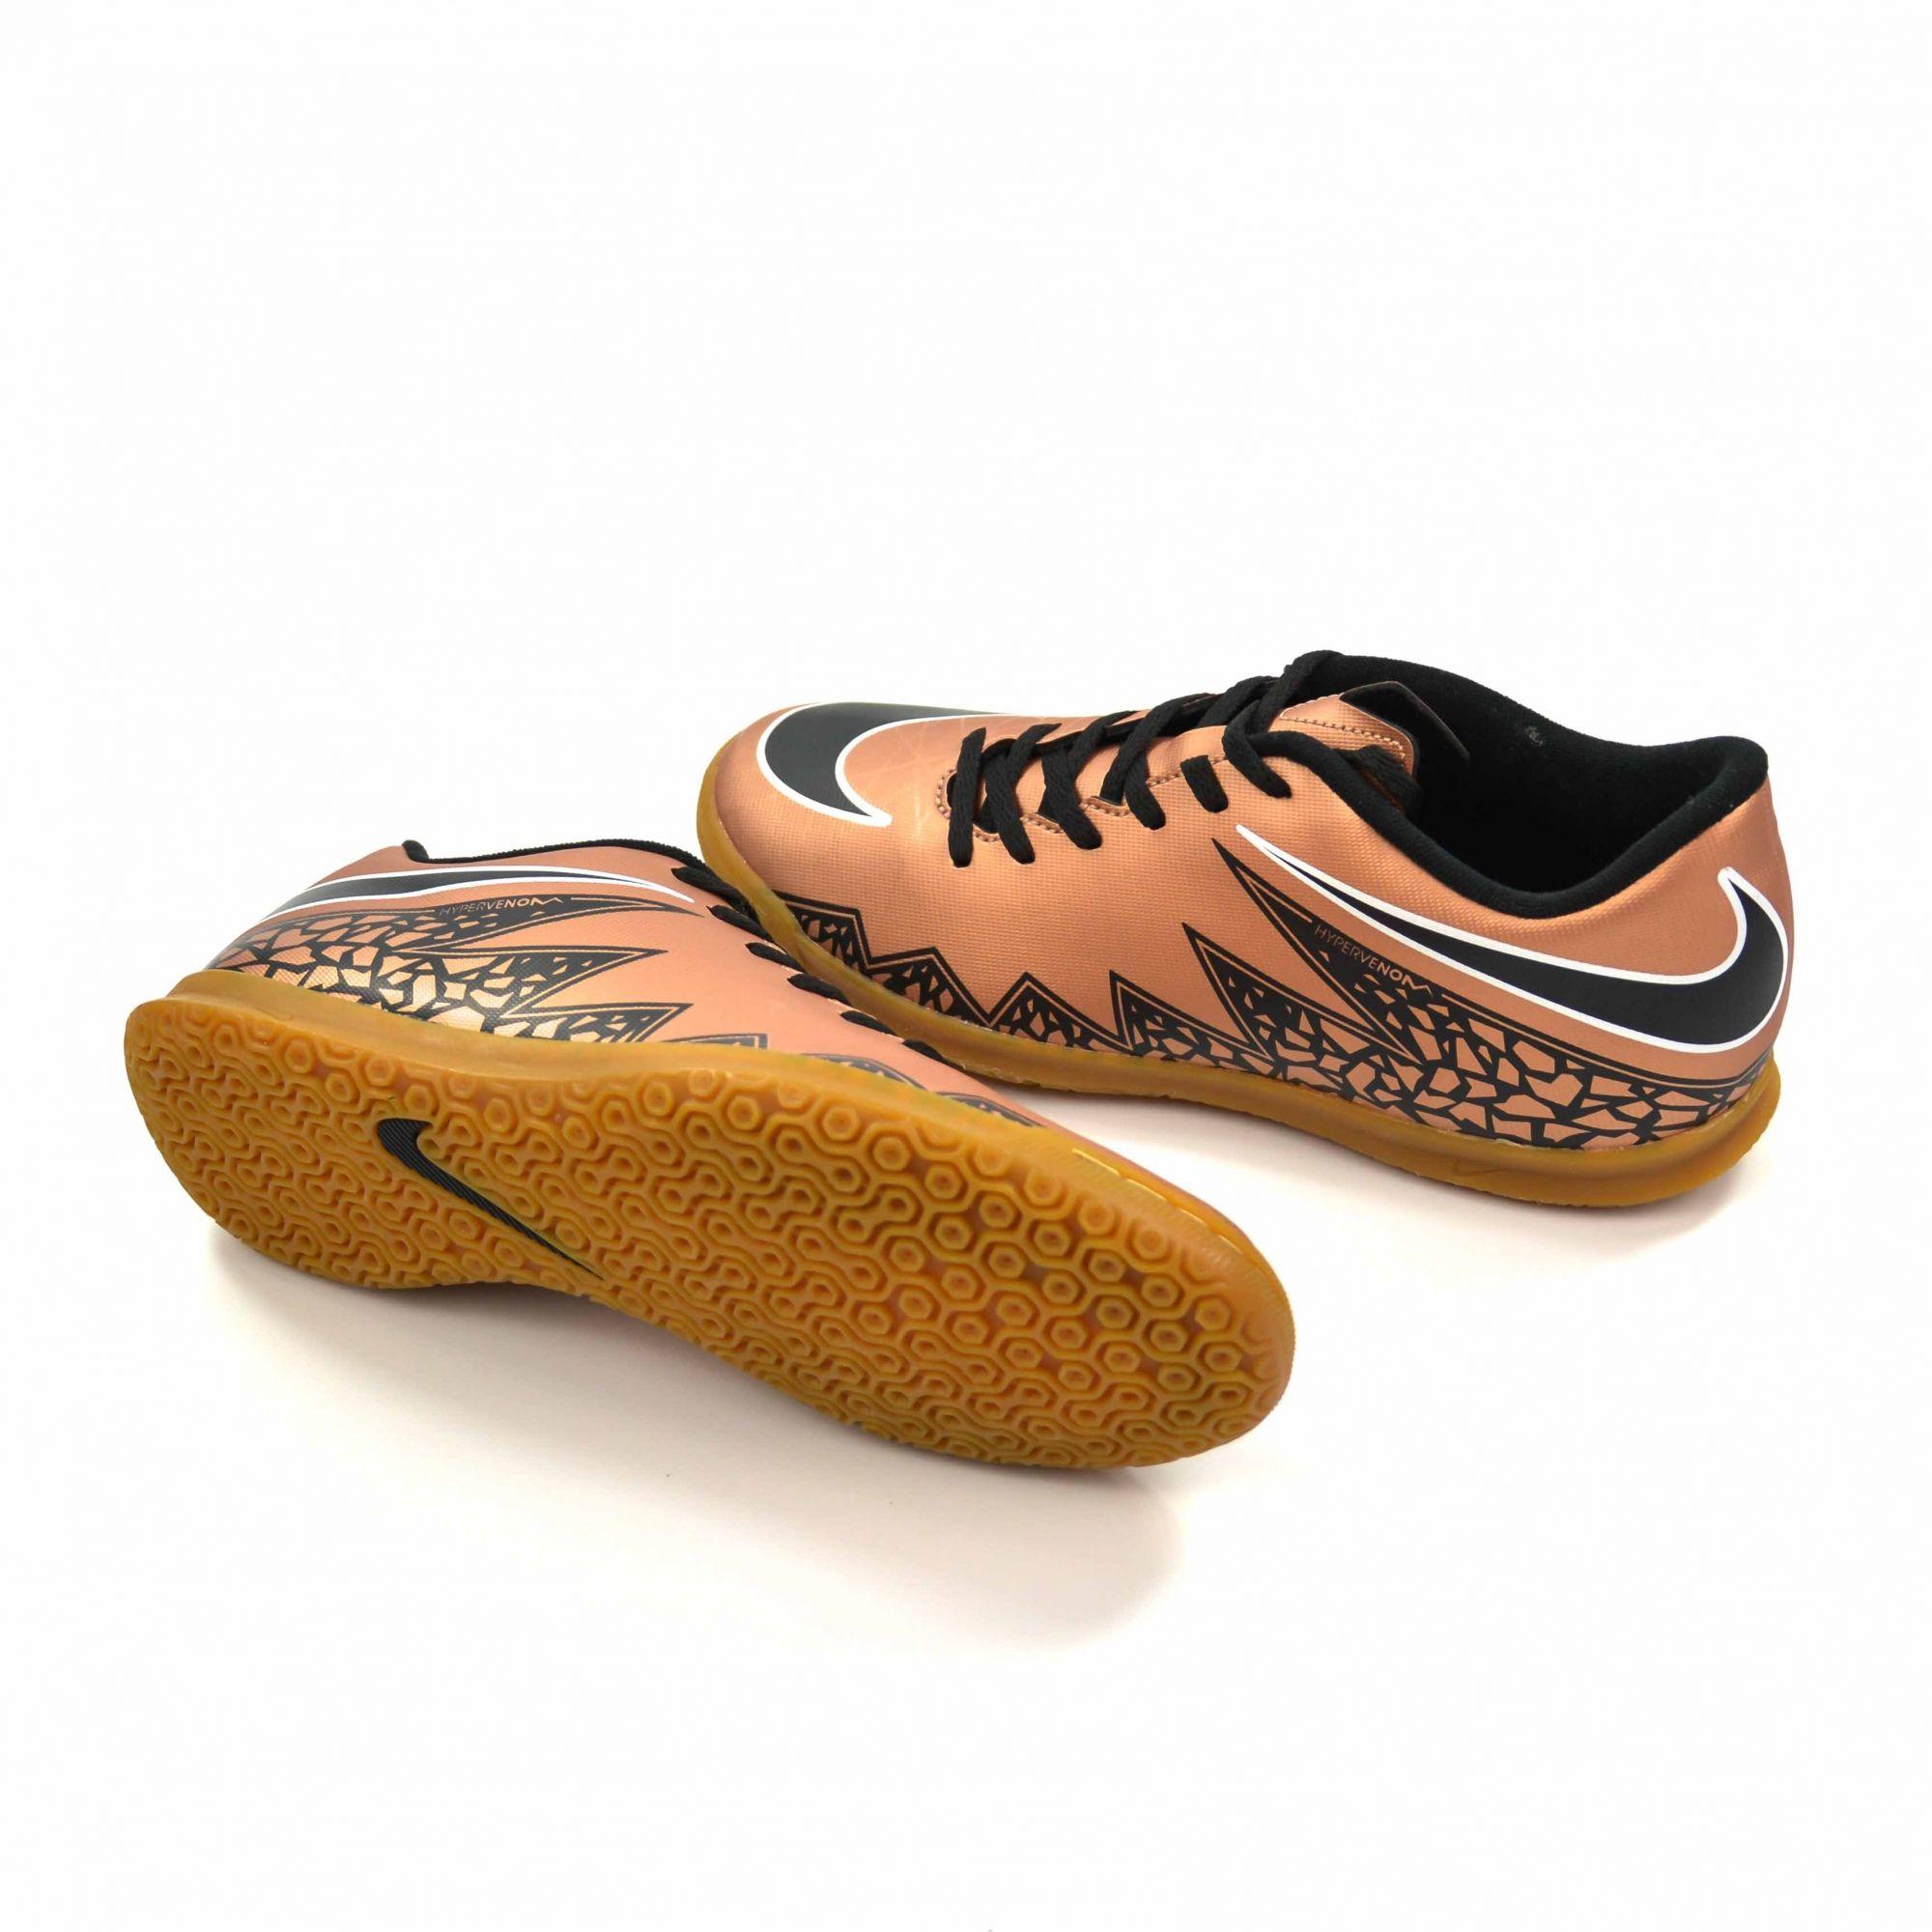 21d7bdda66ca7 Nike TÊNIS FUTSAL HYPERVENOM PHADE II IC GOLD NIKE 010964